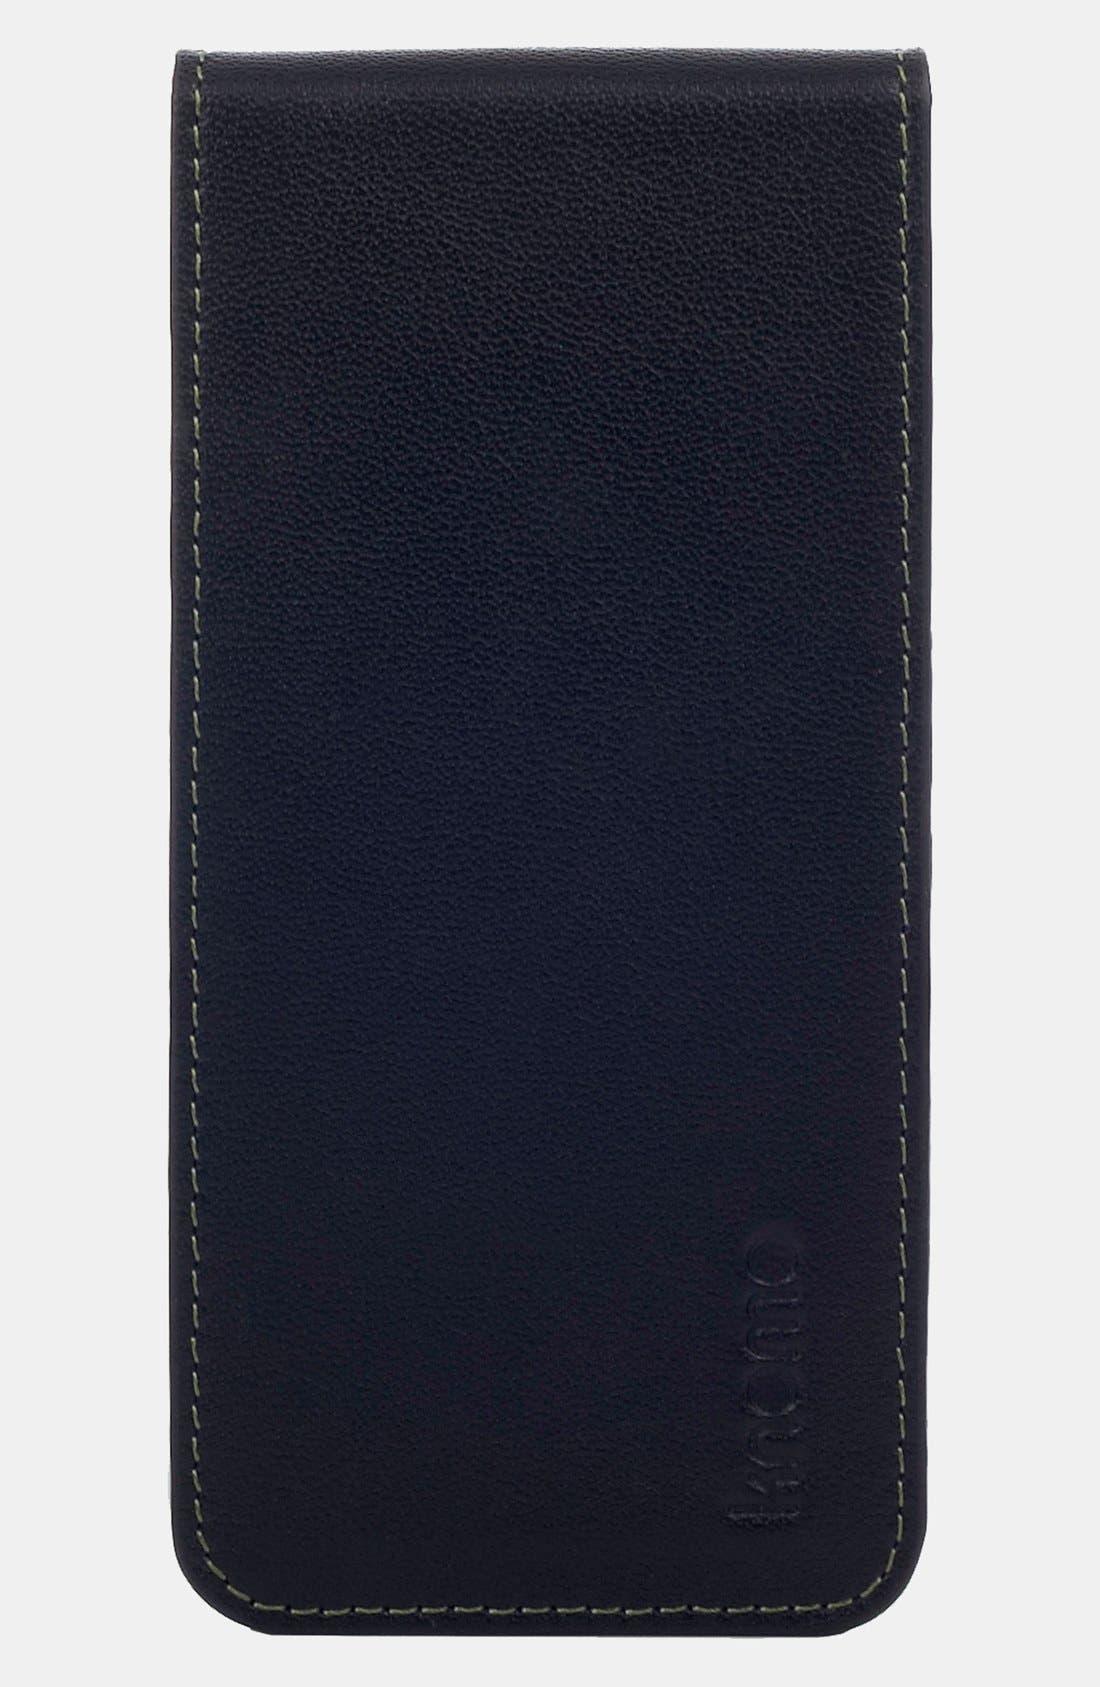 Main Image - KNOMO London iPhone 5 Flip Case